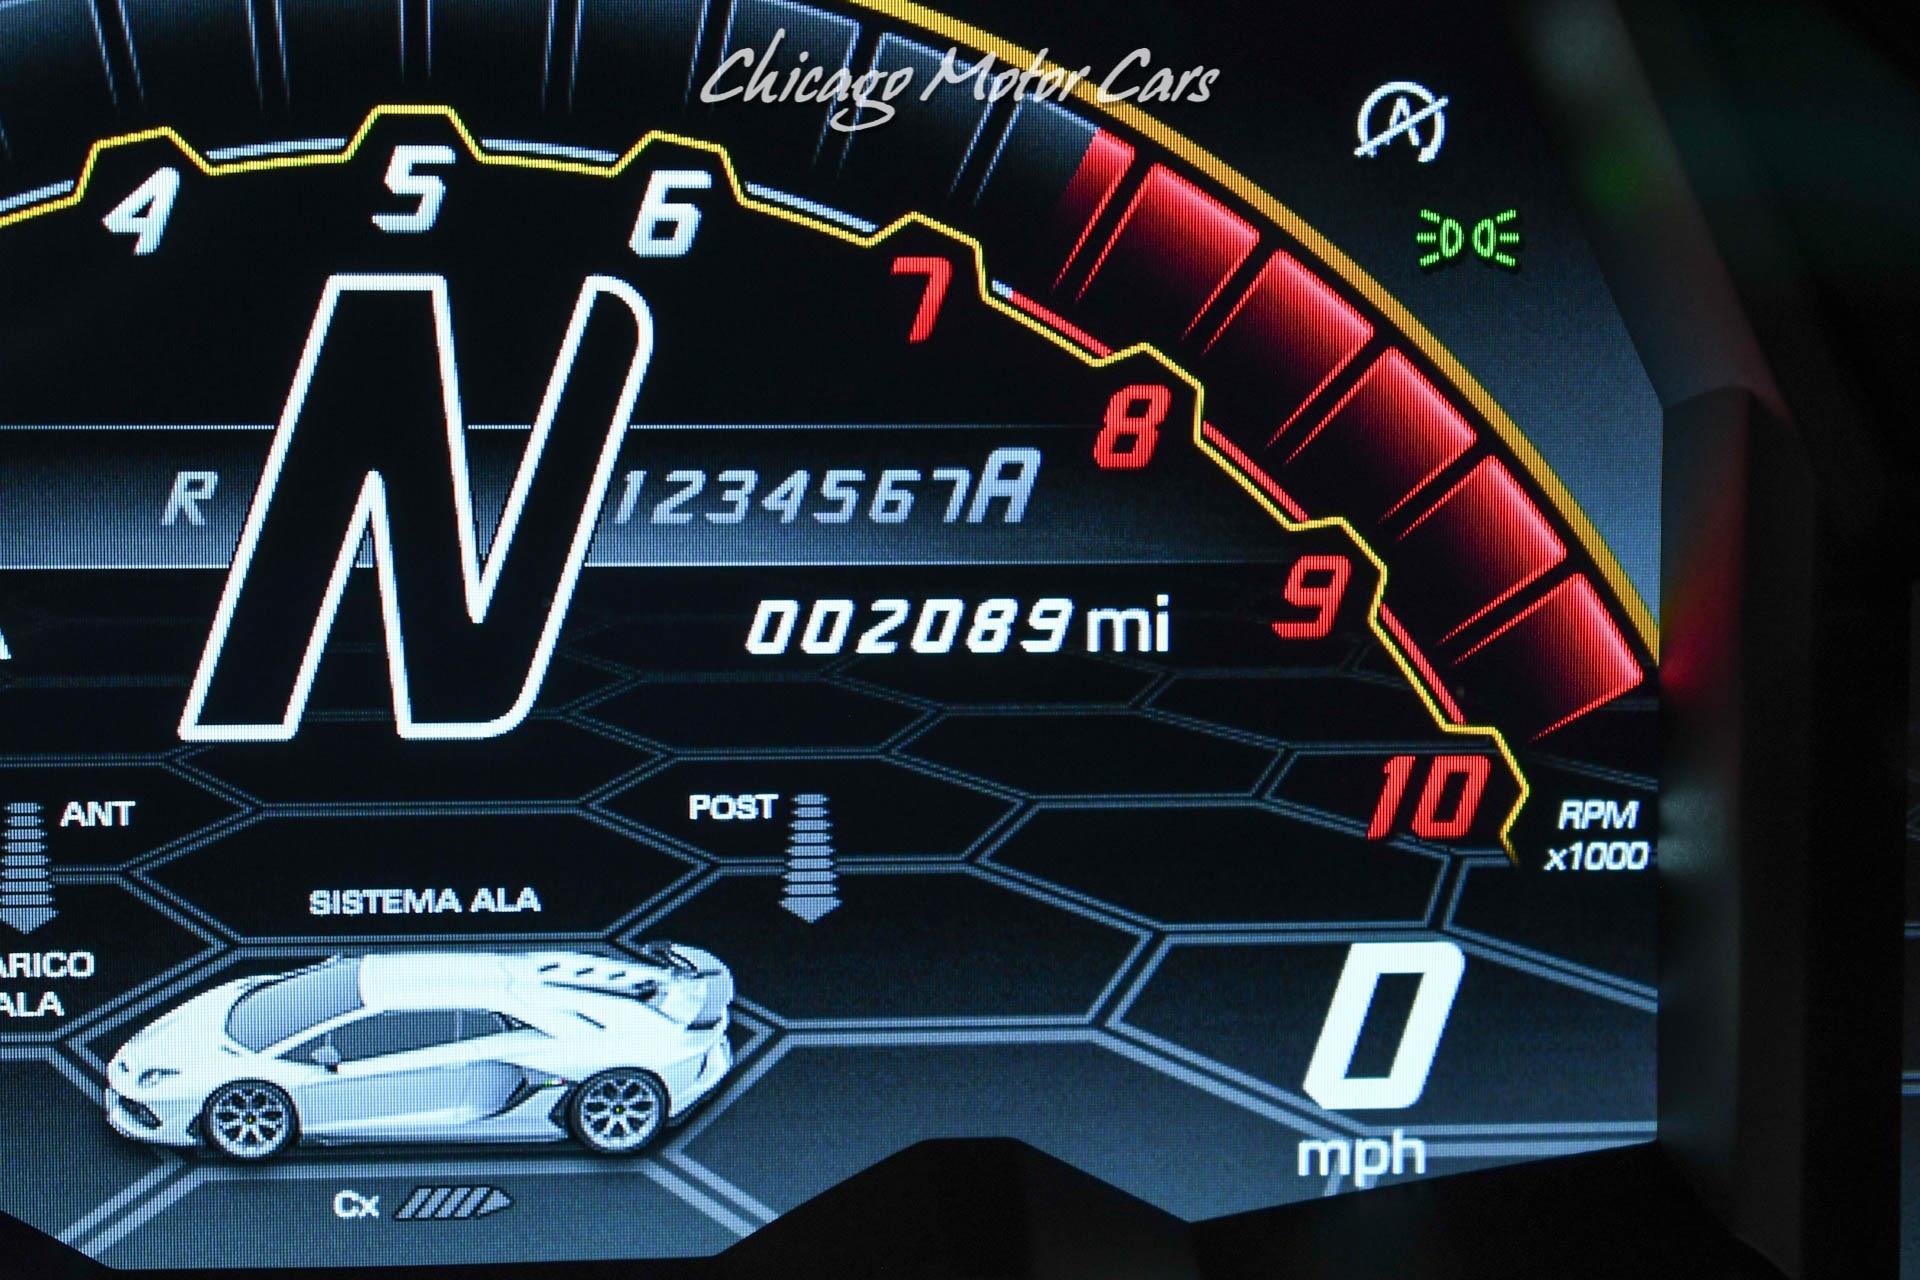 Used-2019-Lamborghini-Aventador-LP770-4-SVJ-Coupe-Only-2k-Miles-HARD-LOADED-Carbon-Fiber